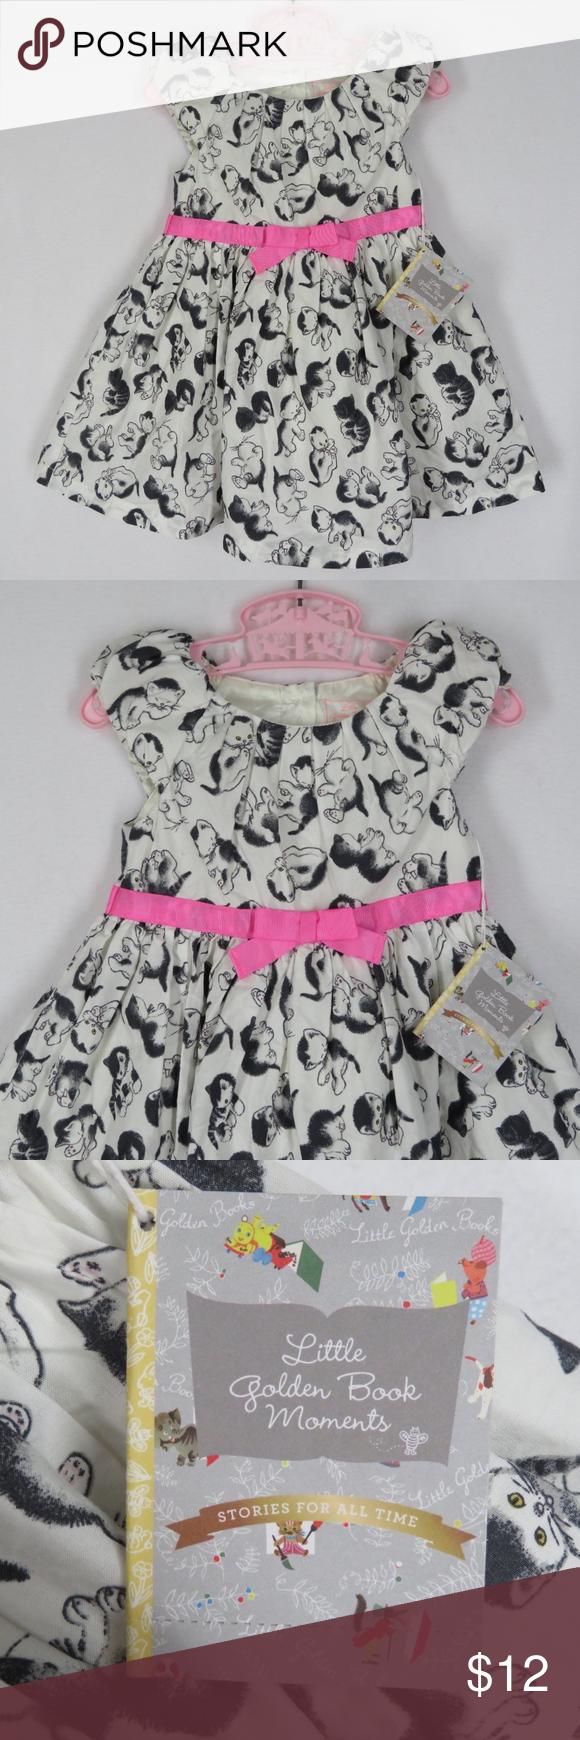 d61137f94 Shy Little Kitten Dress Golden Book Moments 2T ADORABLE Shy Little Kitten  toddlers dress by Little